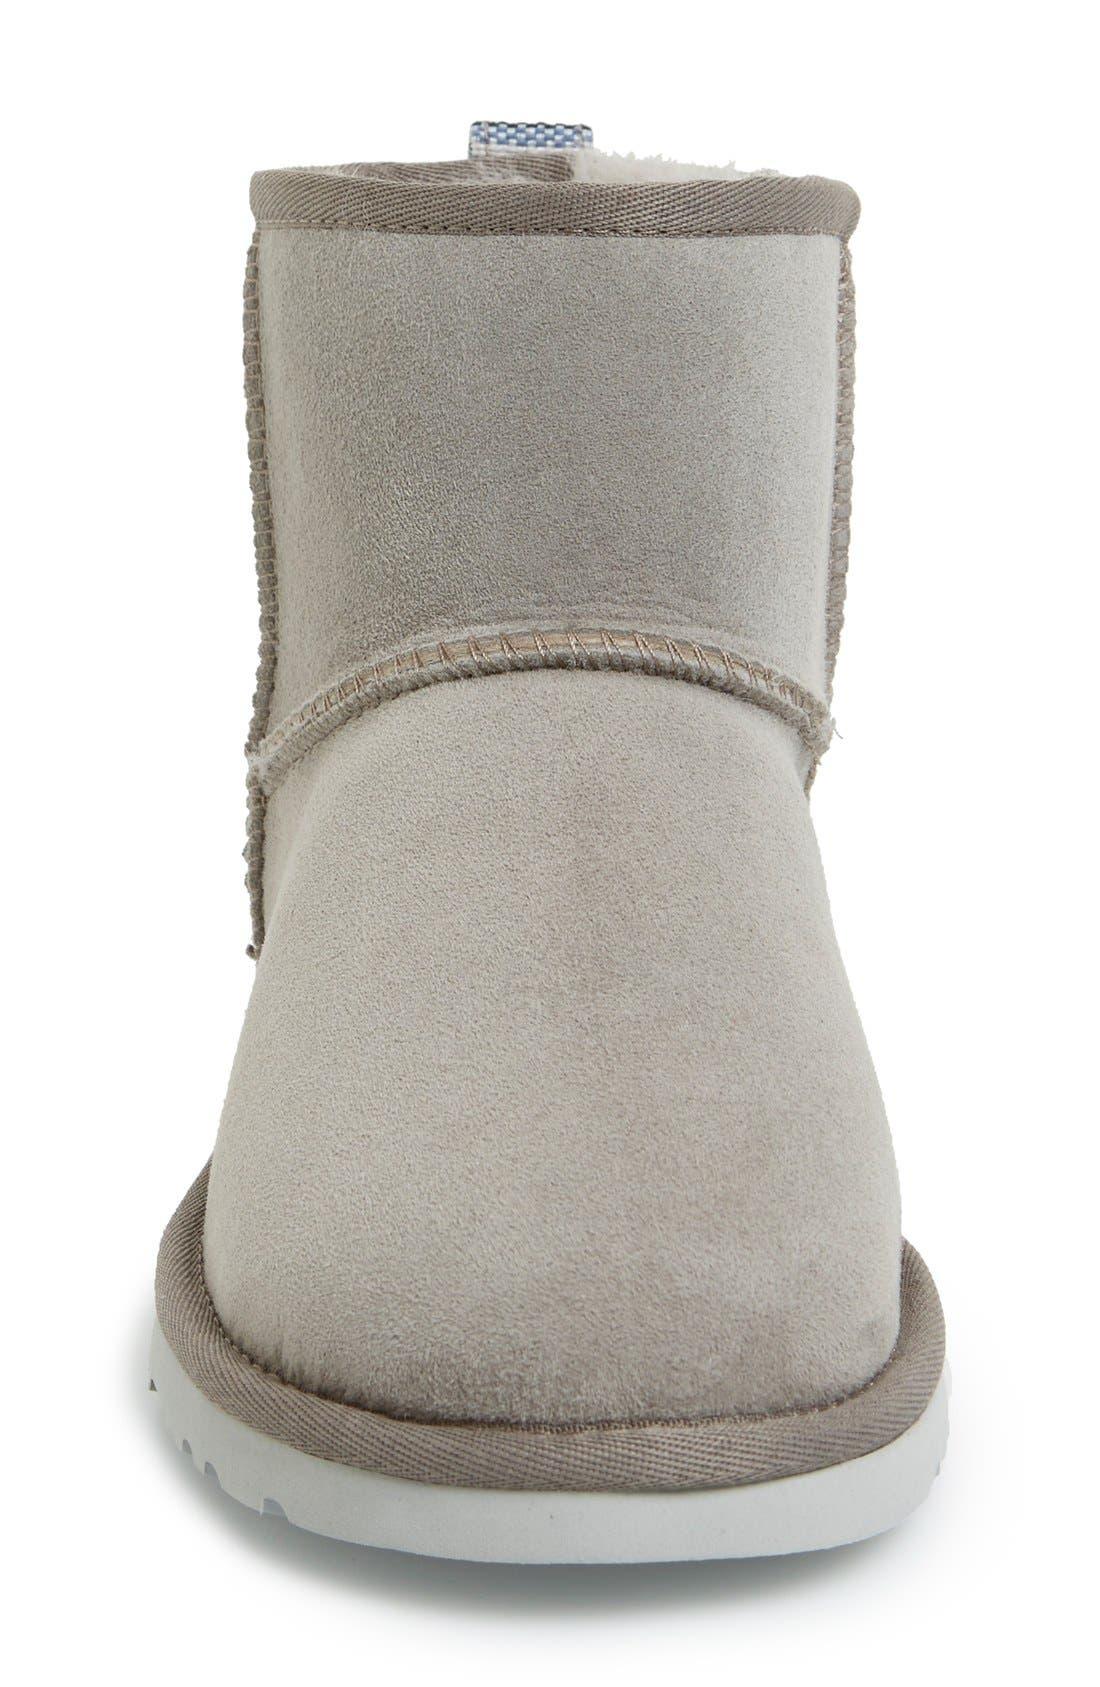 'Classic Mini Serape' Genuine Shearling Lined Boot,                             Alternate thumbnail 2, color,                             024